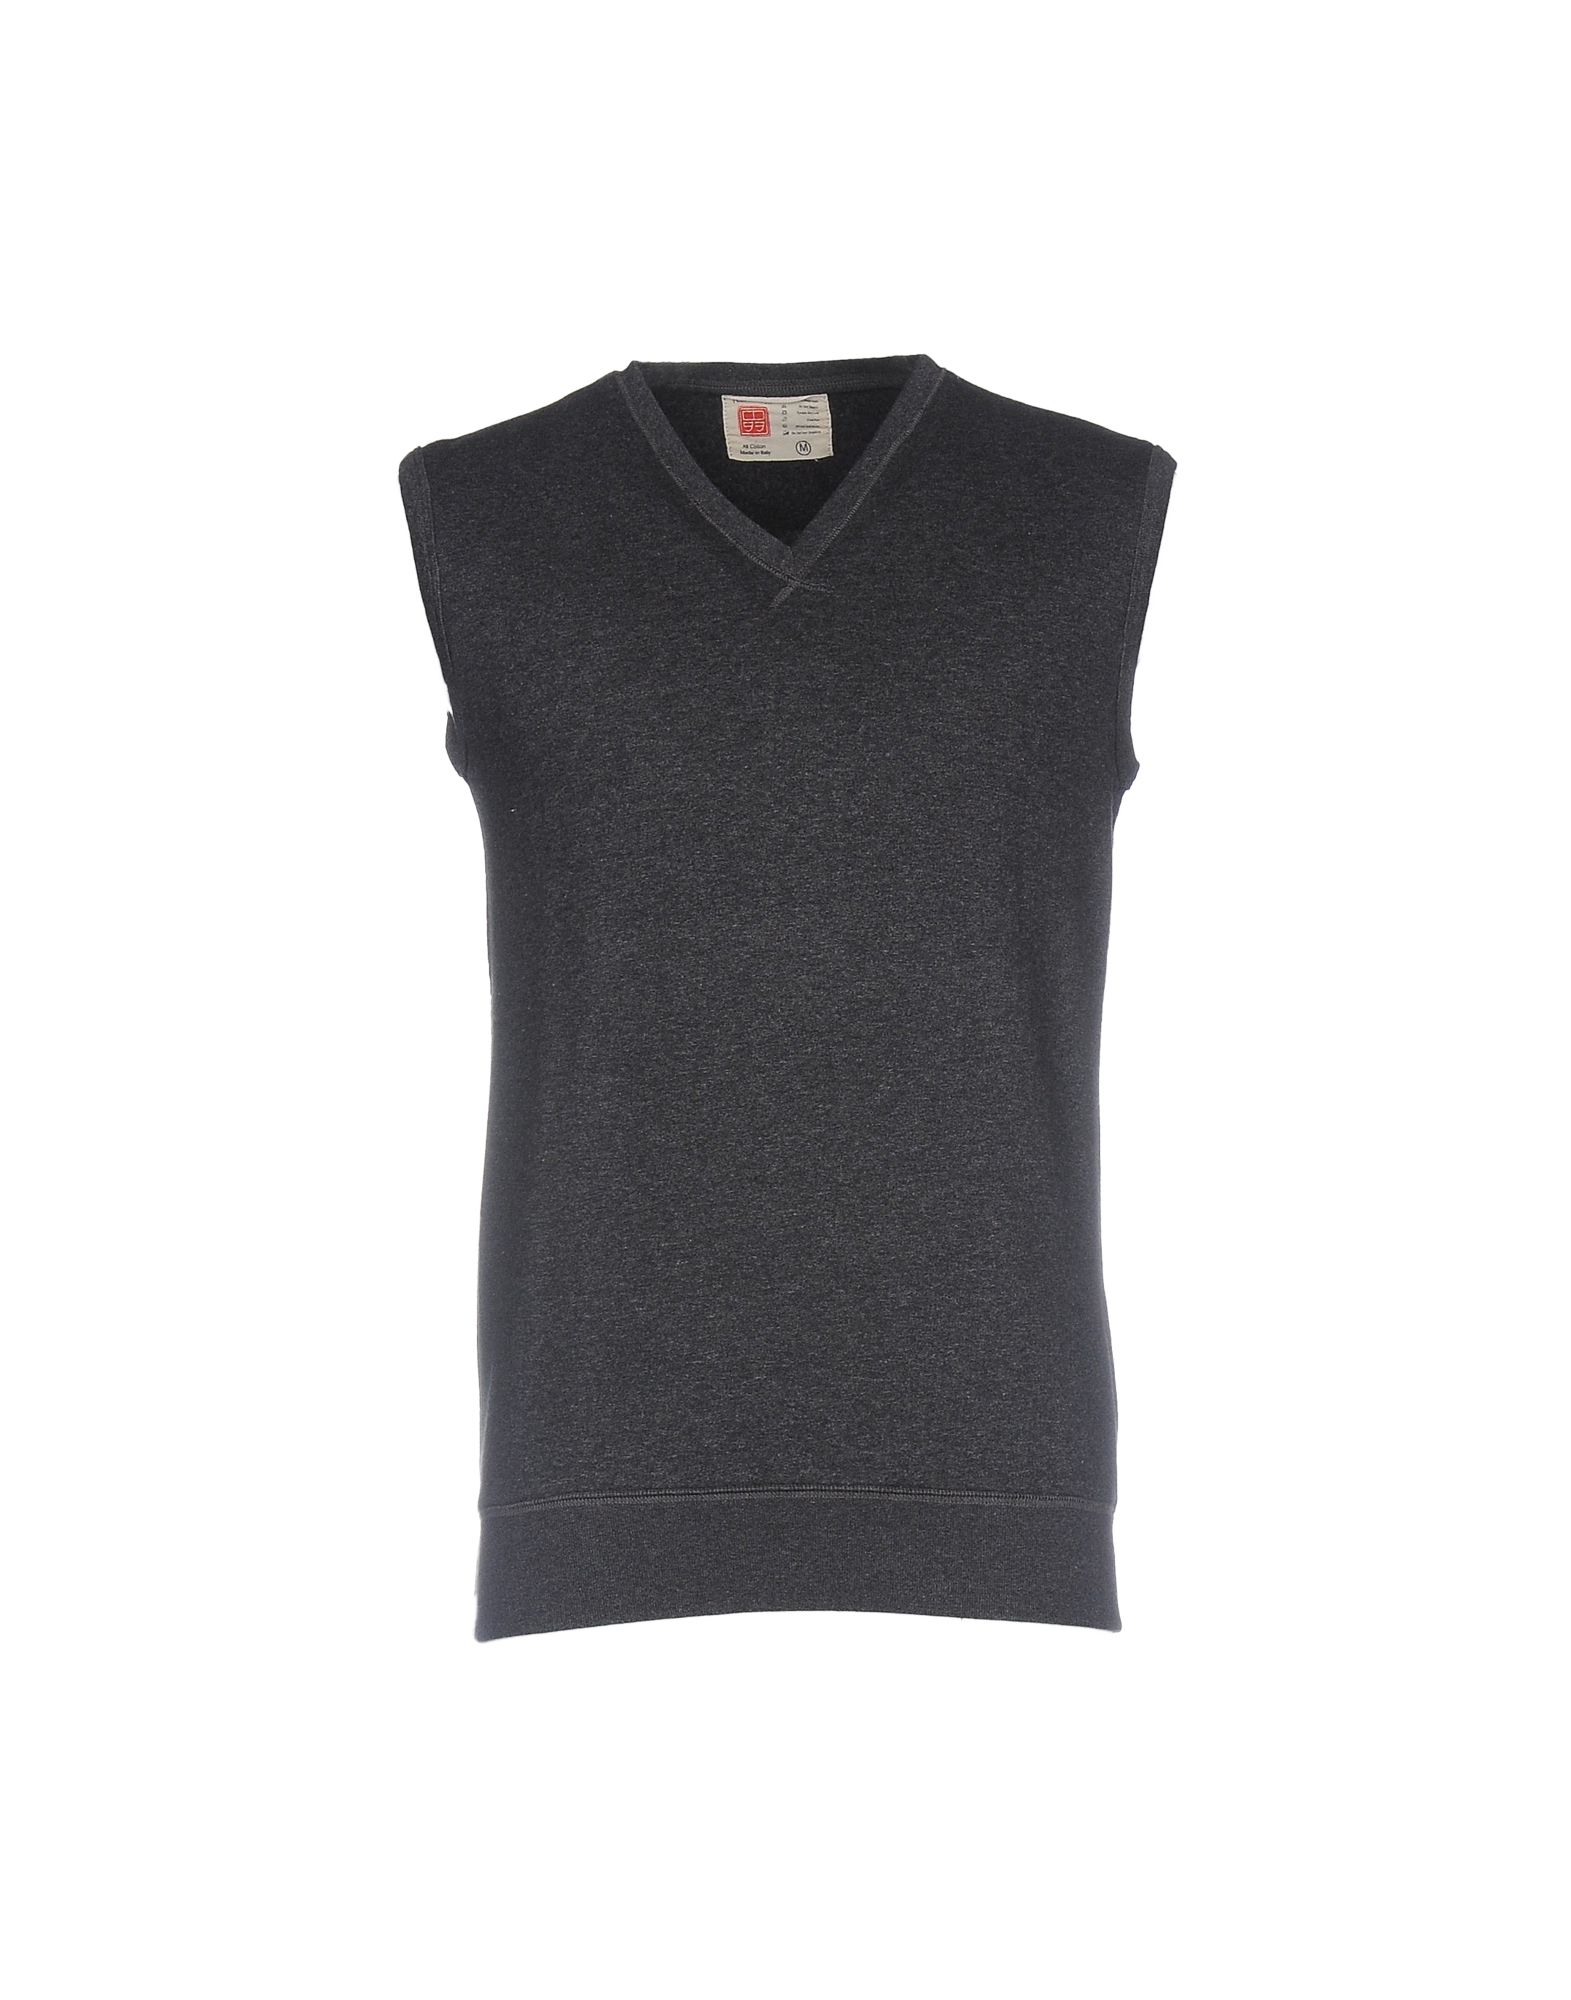 Homme Bakuto893 Sur Shirts Yoox Sweat Shirt q8a4w1T